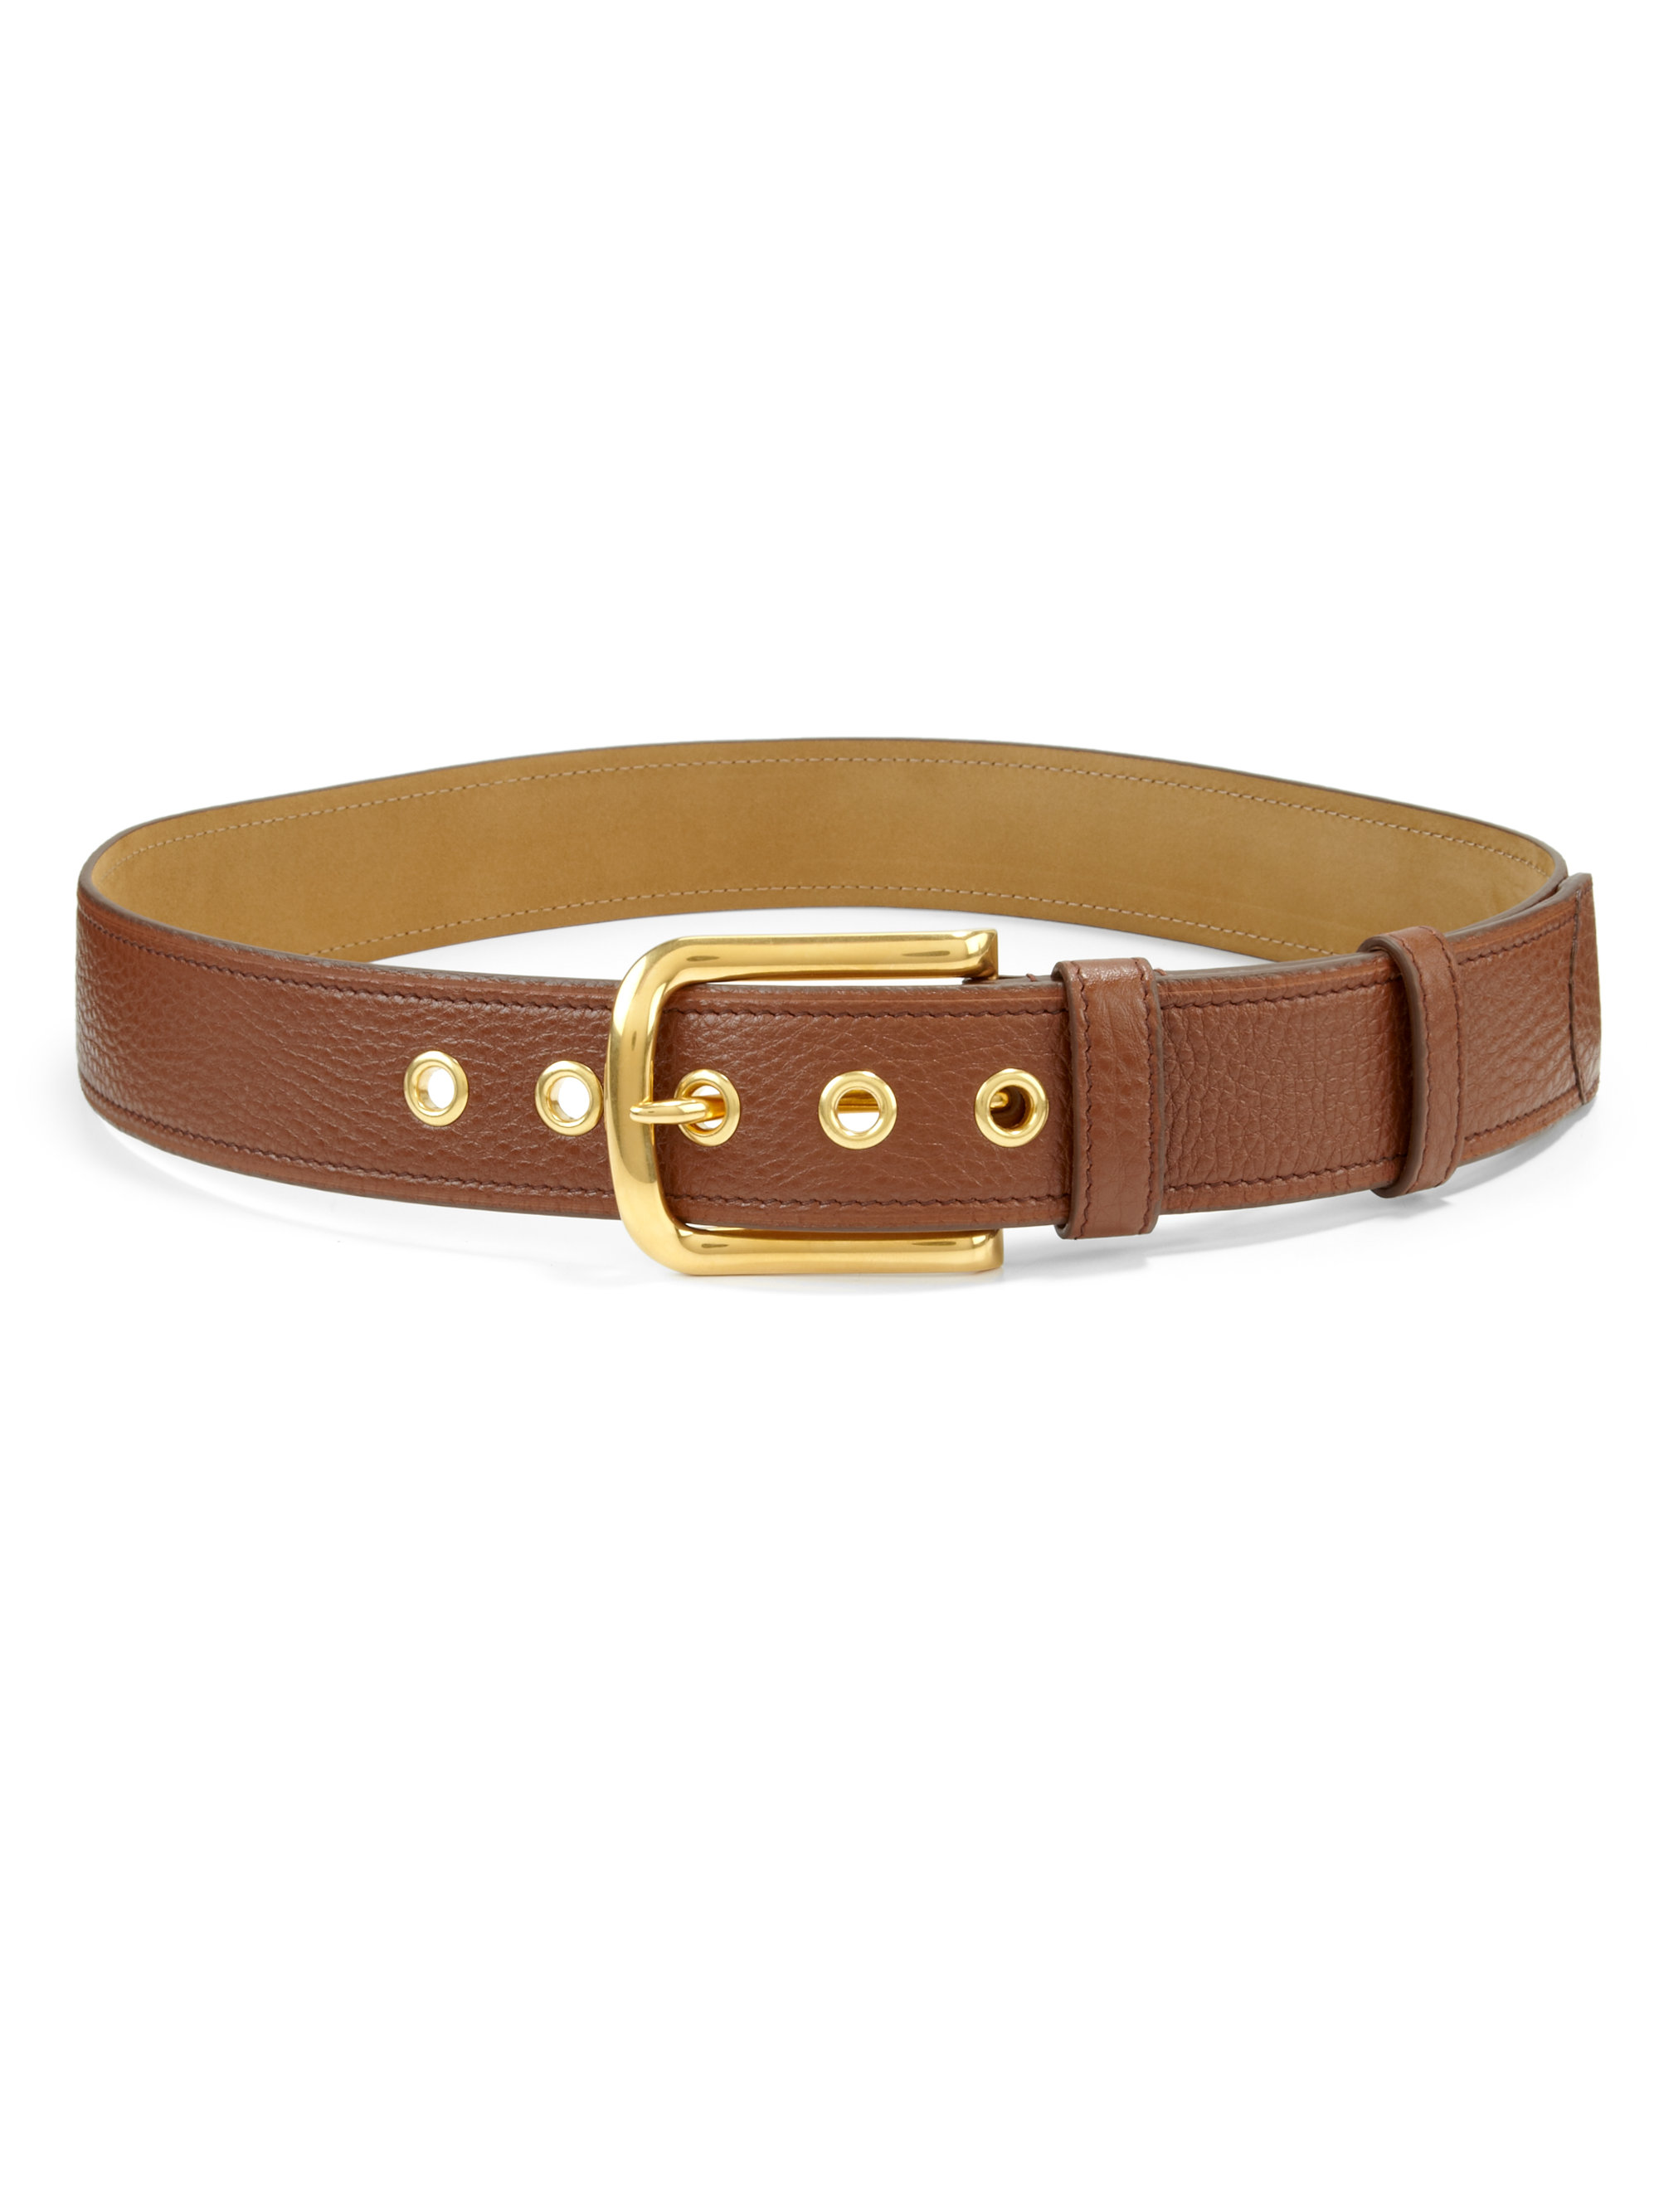 Prada Classic Daino Leather Belt in Brown | Lyst